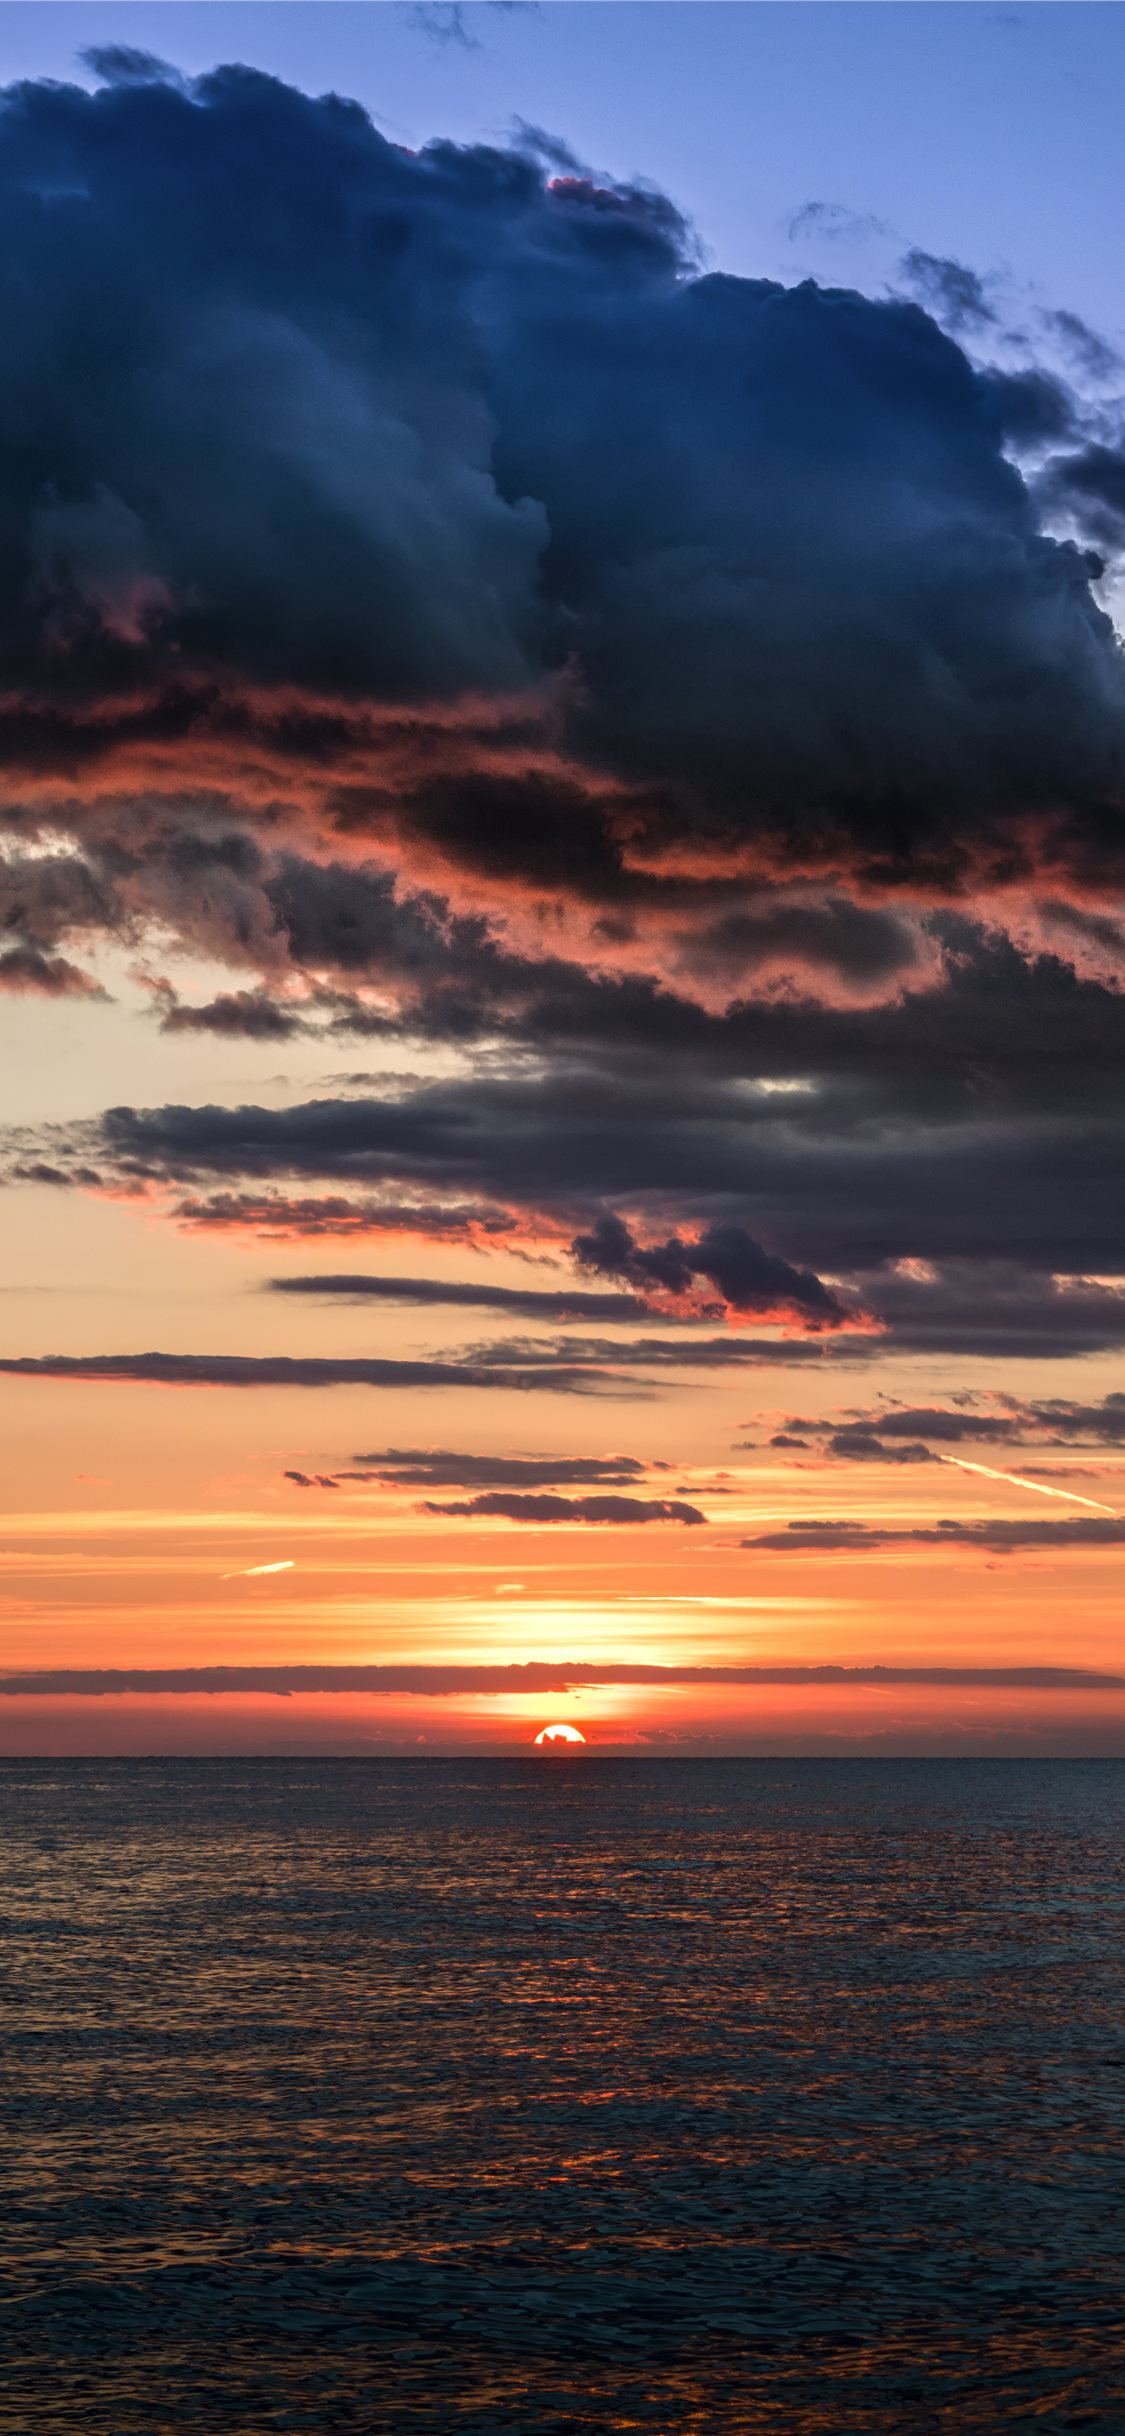 Tropical Sunset Croatia Iphone X Wallpaper Download Iphone